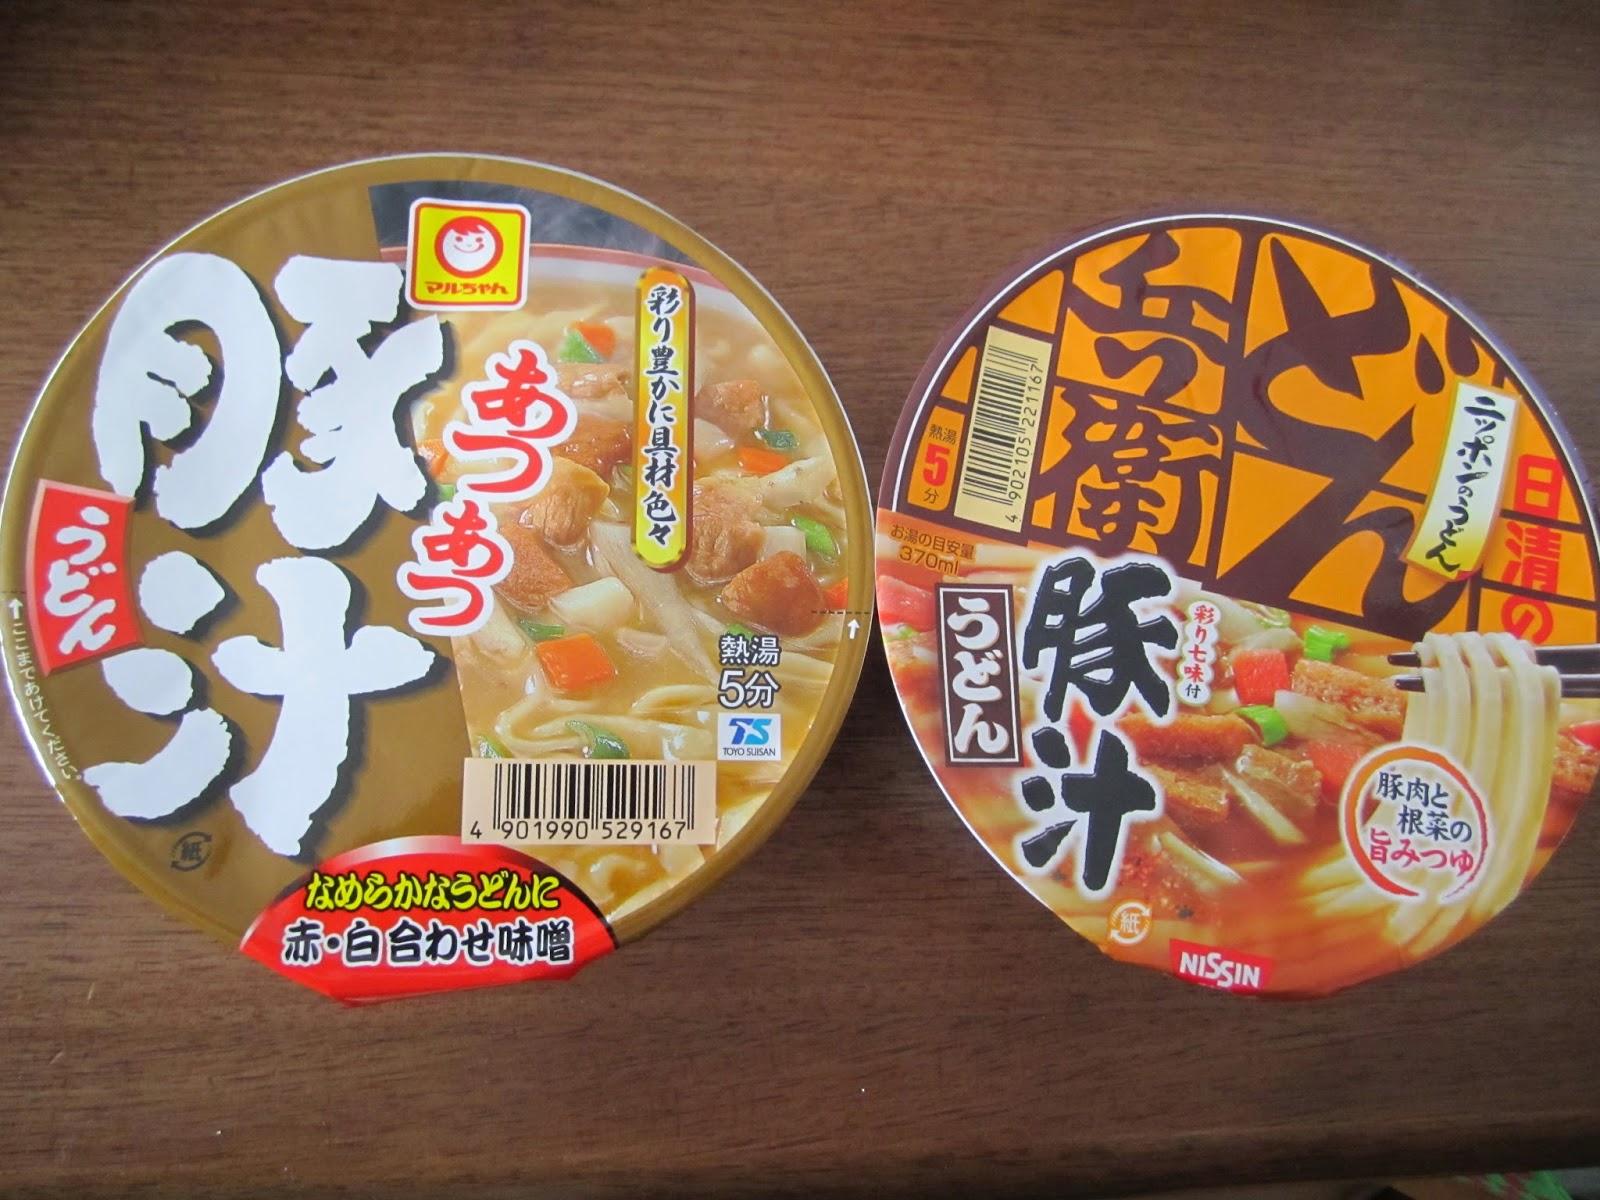 maruchan nissin instant tonjiru udon